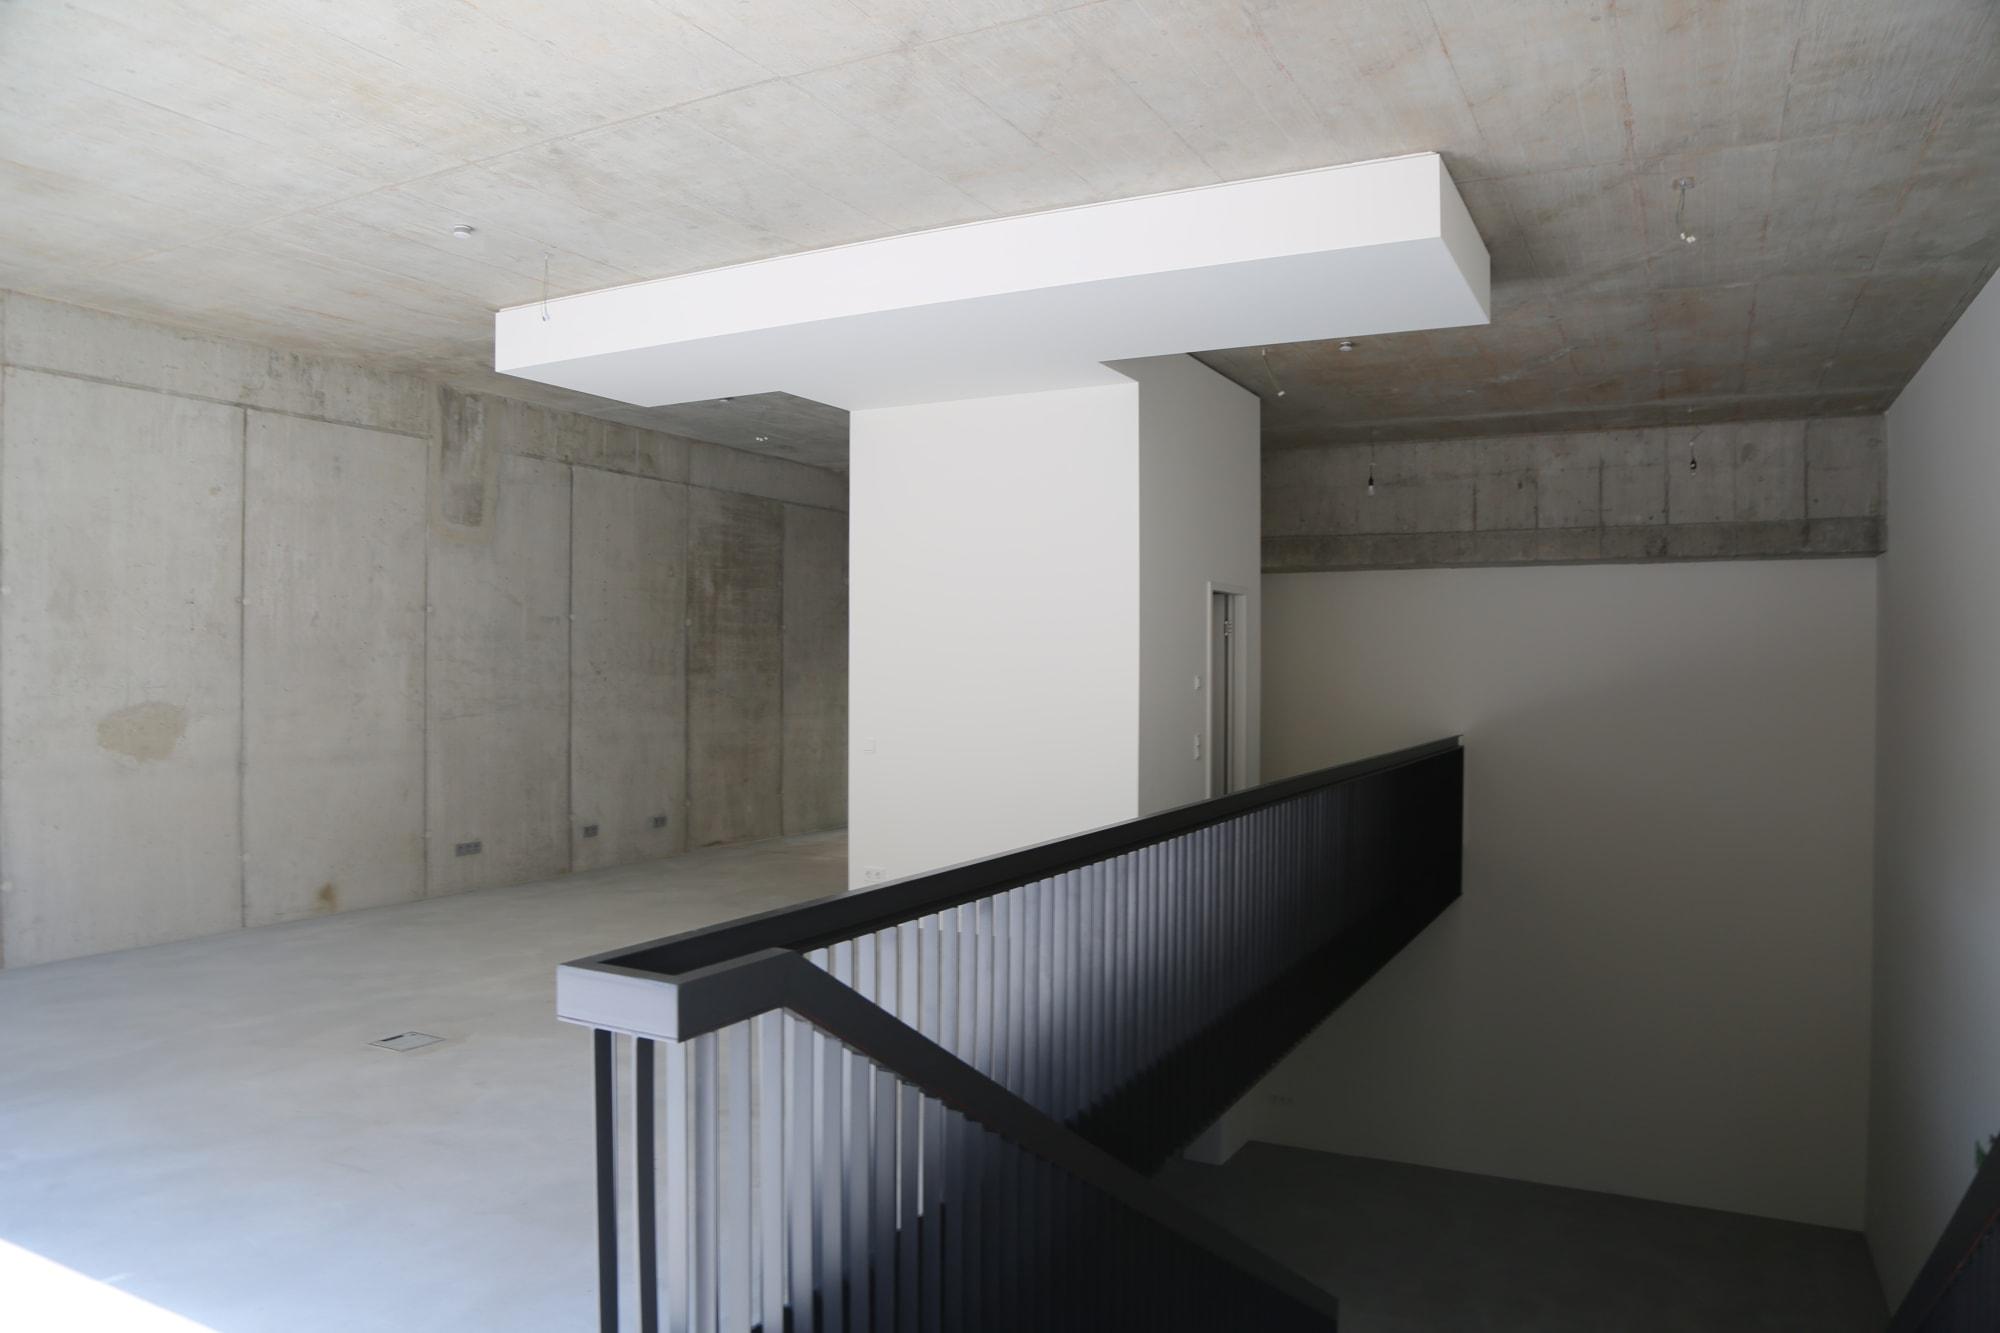 NEW GALLERY SPACE IN BERLIN